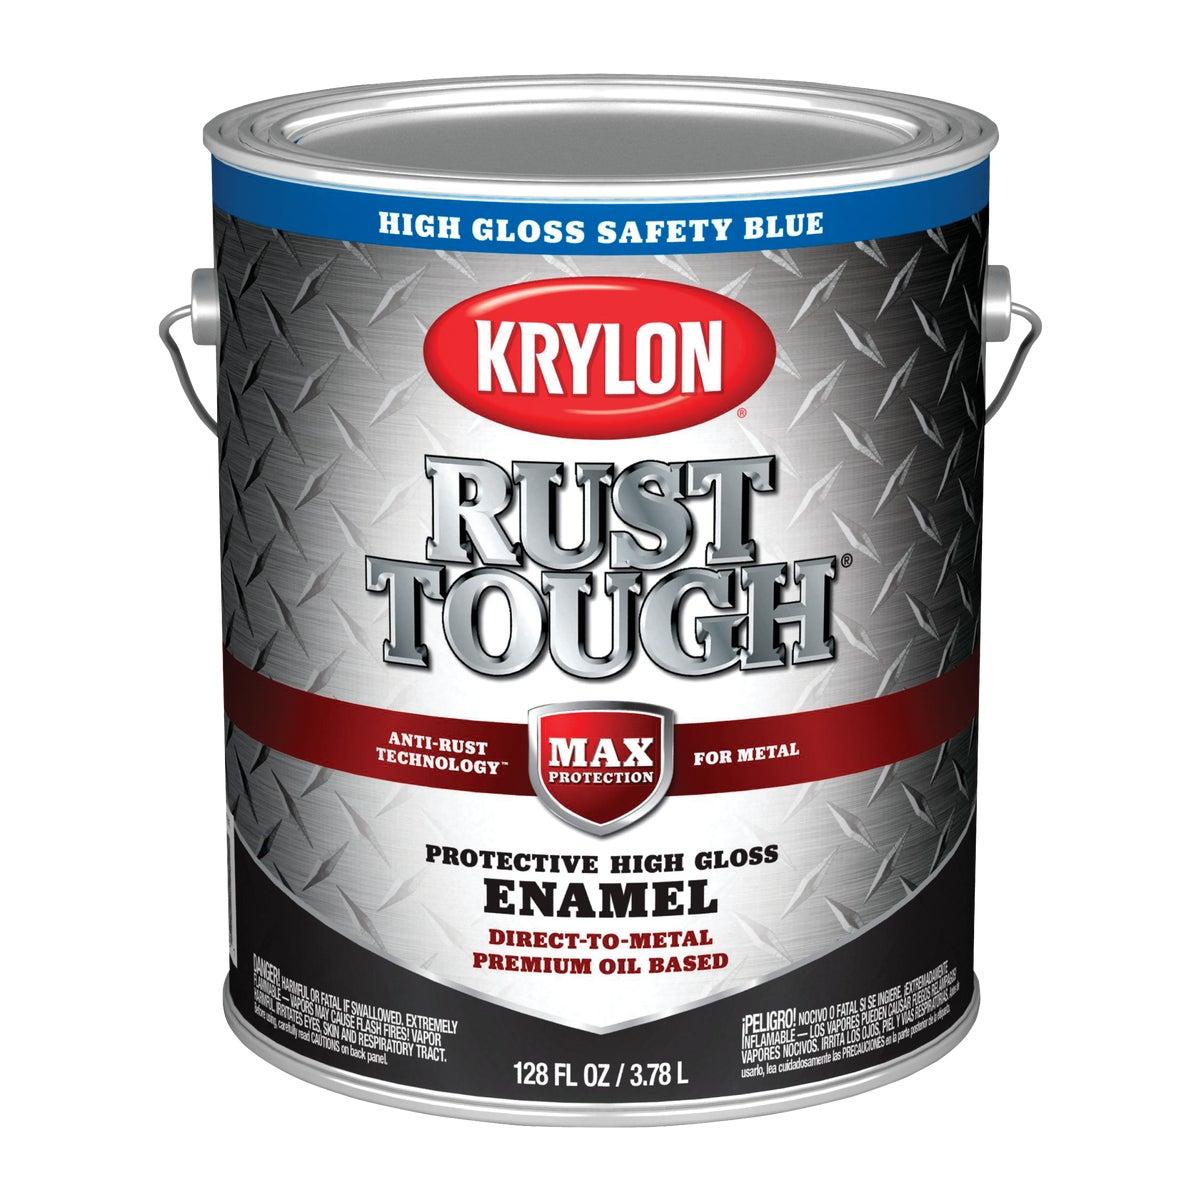 SAFETY BLUE RUST ENAMEL - 044.0021859.007 by Valspar Corp